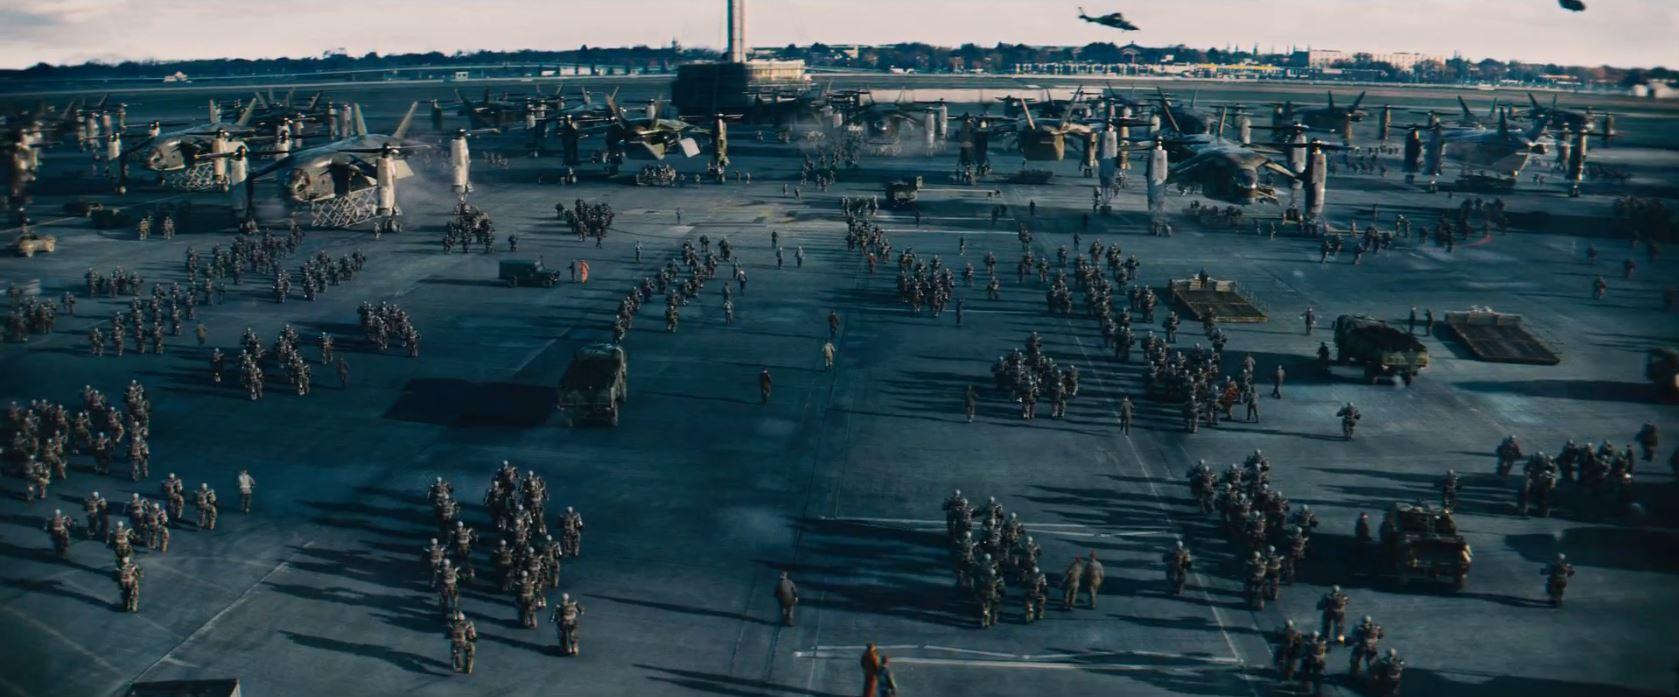 Edge of Tomorrow - Military build up